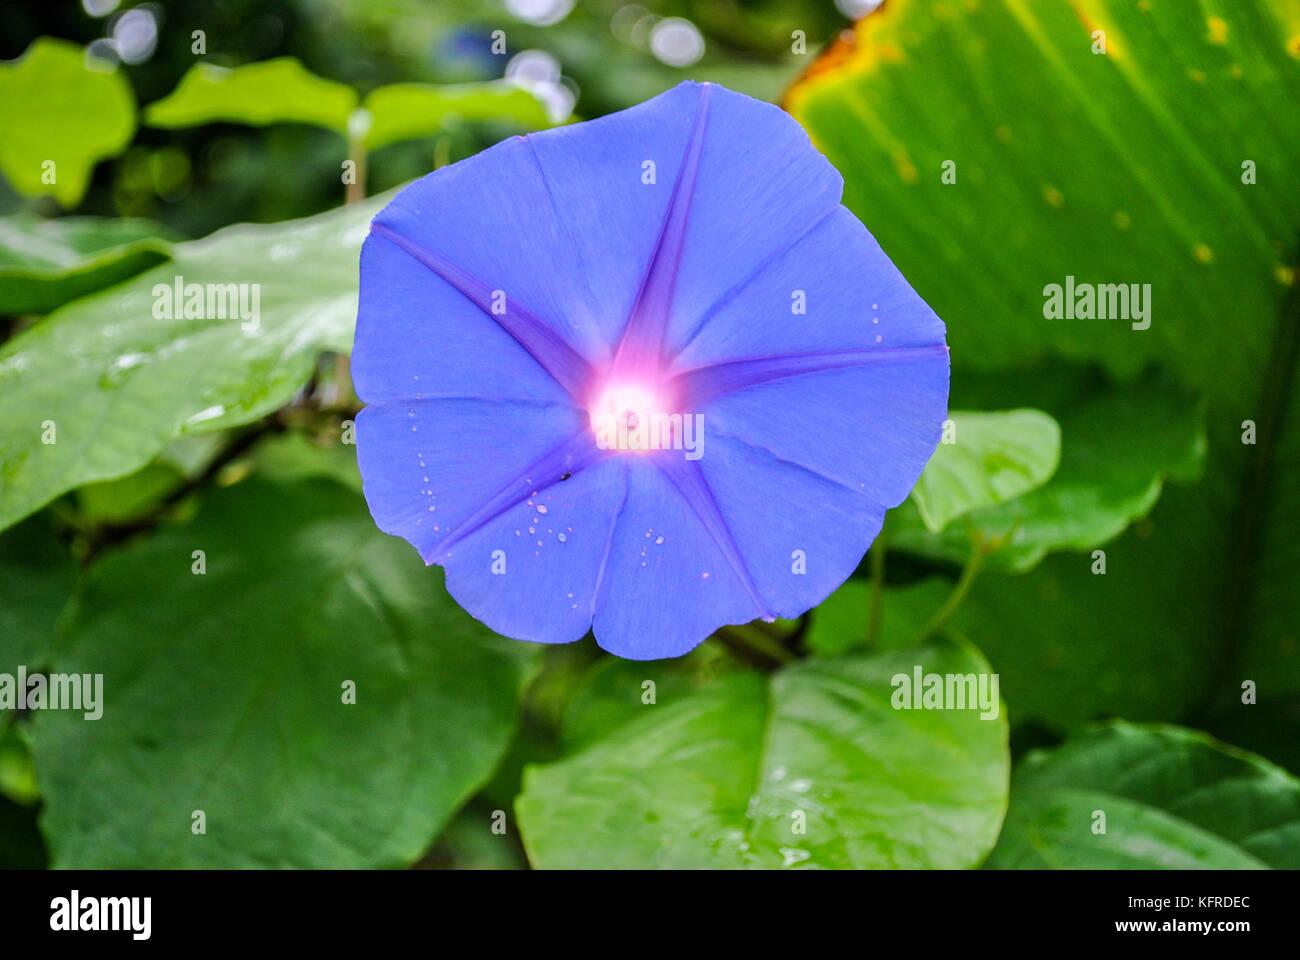 Blue dawn flower stock photos blue dawn flower stock images alamy blue dawn flower ipomoea acuminata stock image izmirmasajfo